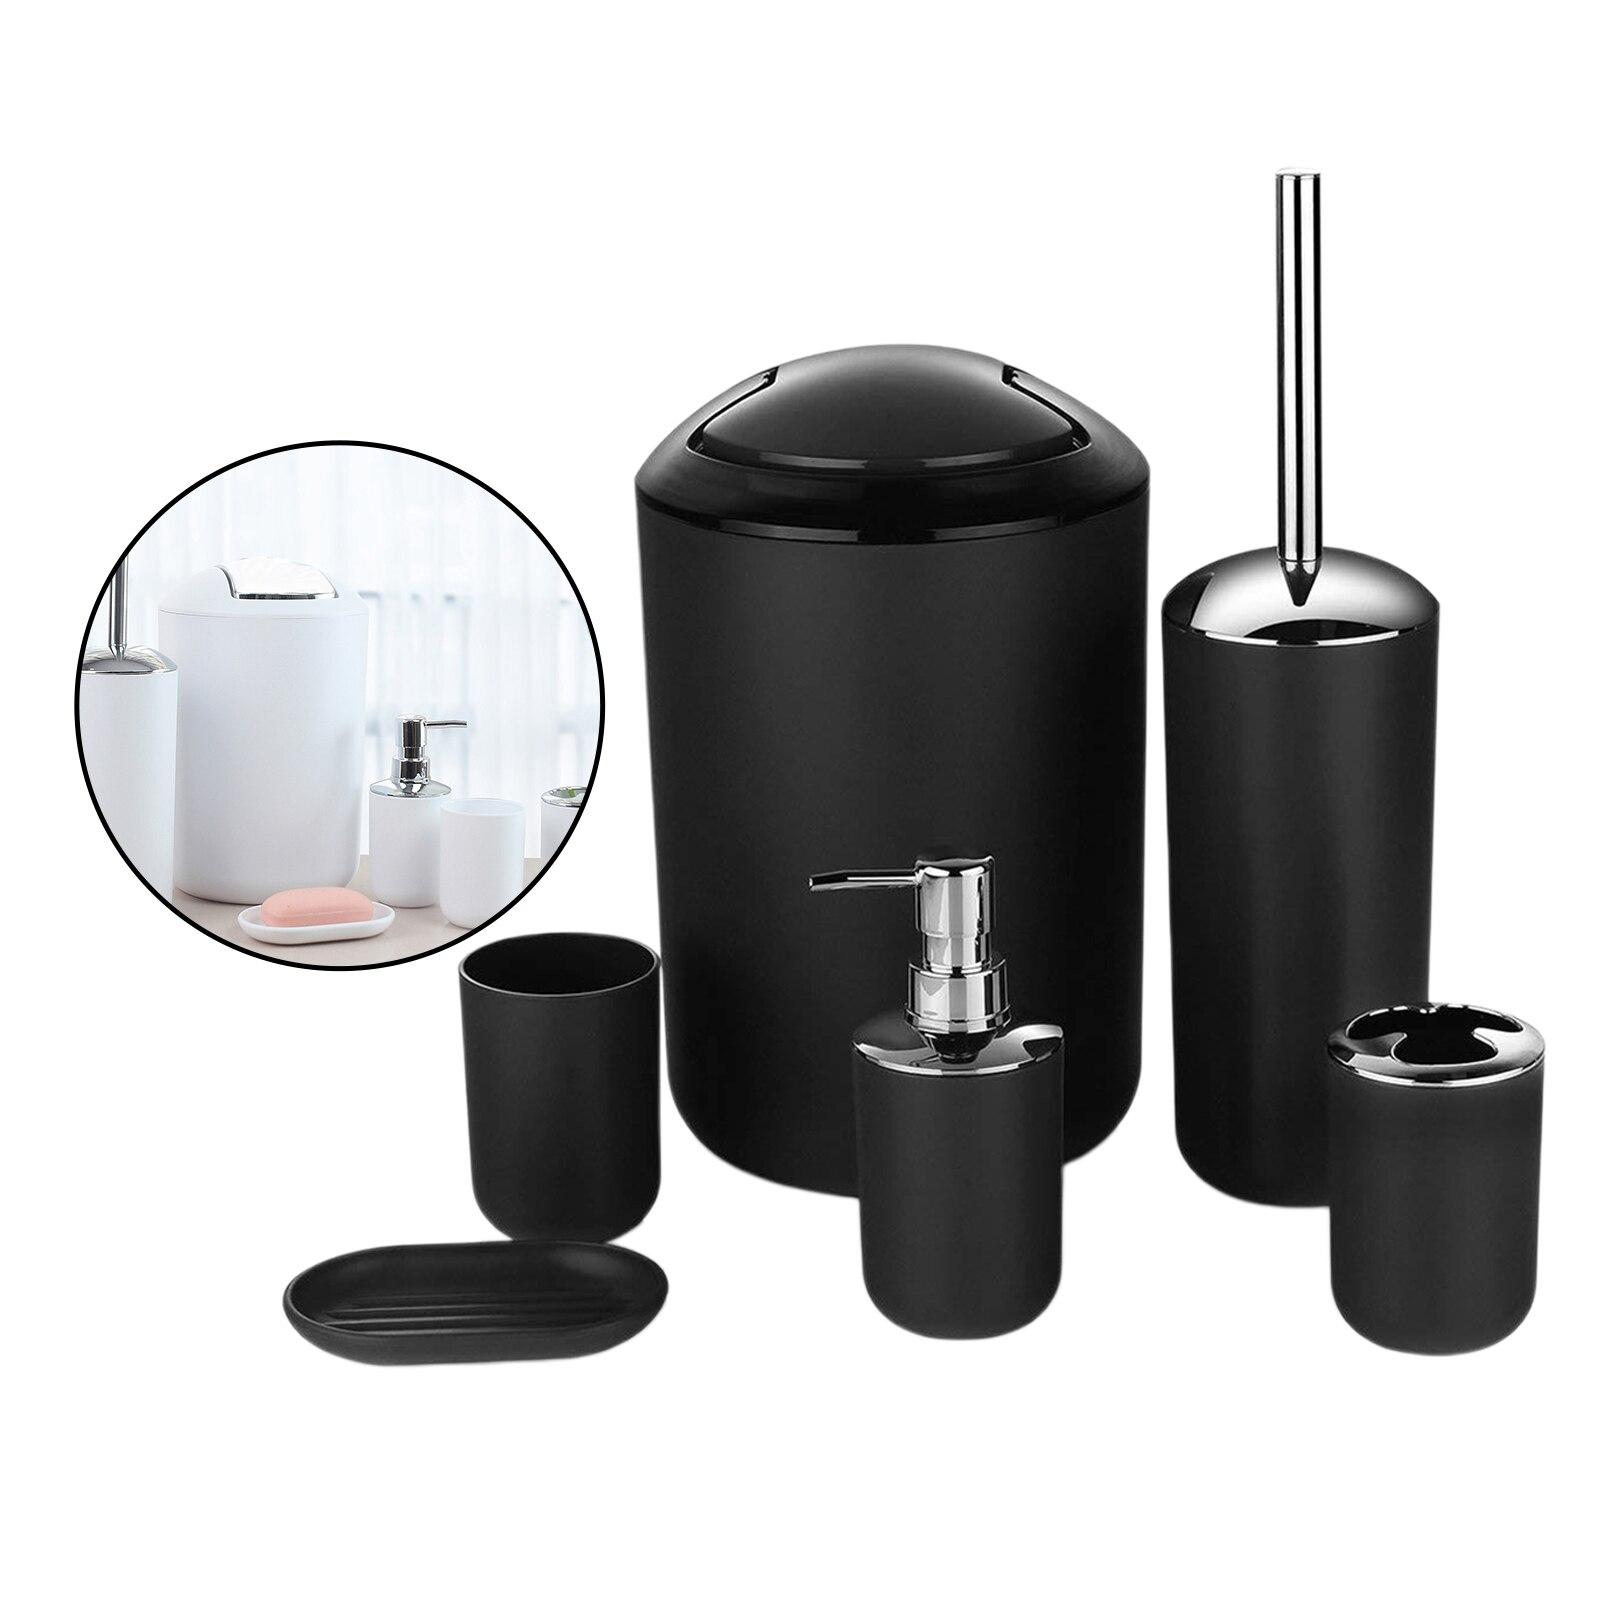 6Pcs Bathroom Set Toilet Brush Holder Toothbrush Cup Soap Dispenser Soap Dish Bathroom Accessories